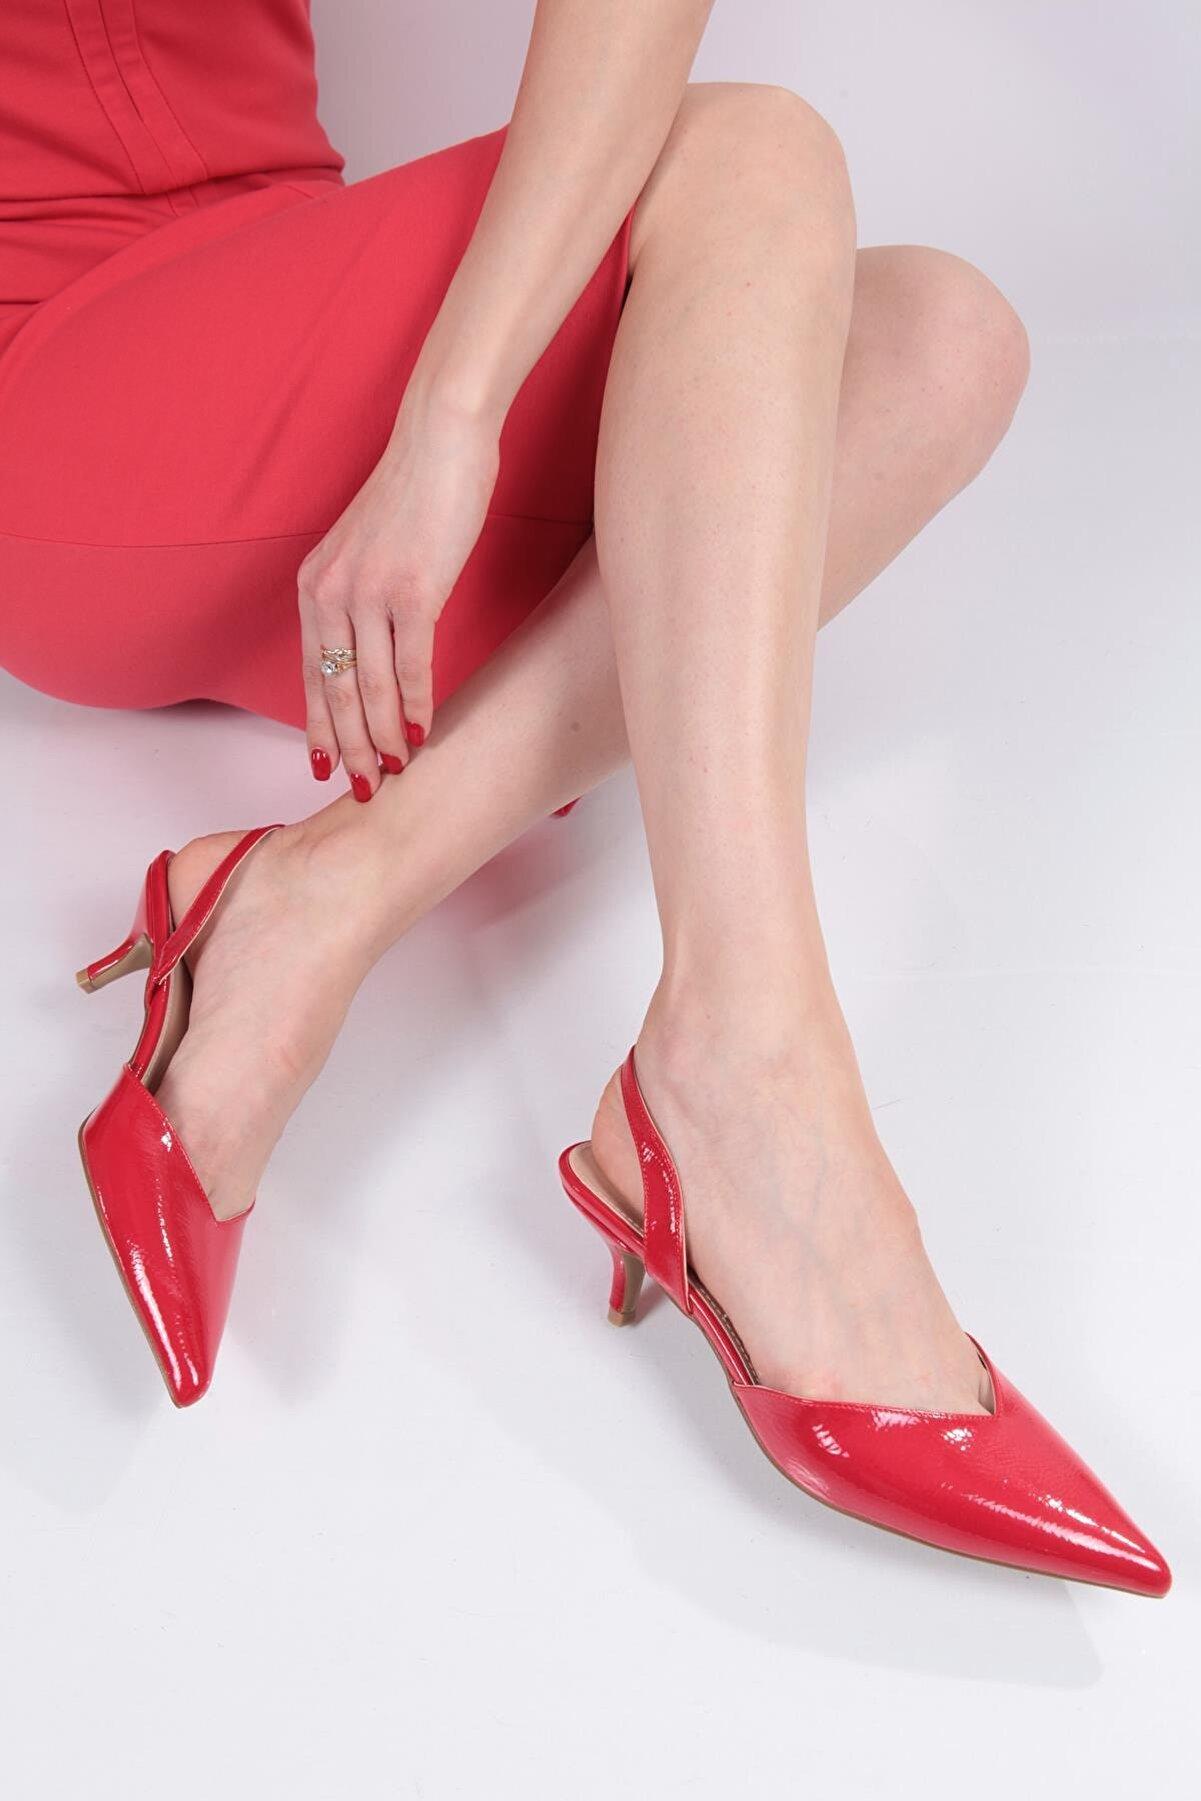 Capone Outfitters Kadın Topuklu Ayakkabı